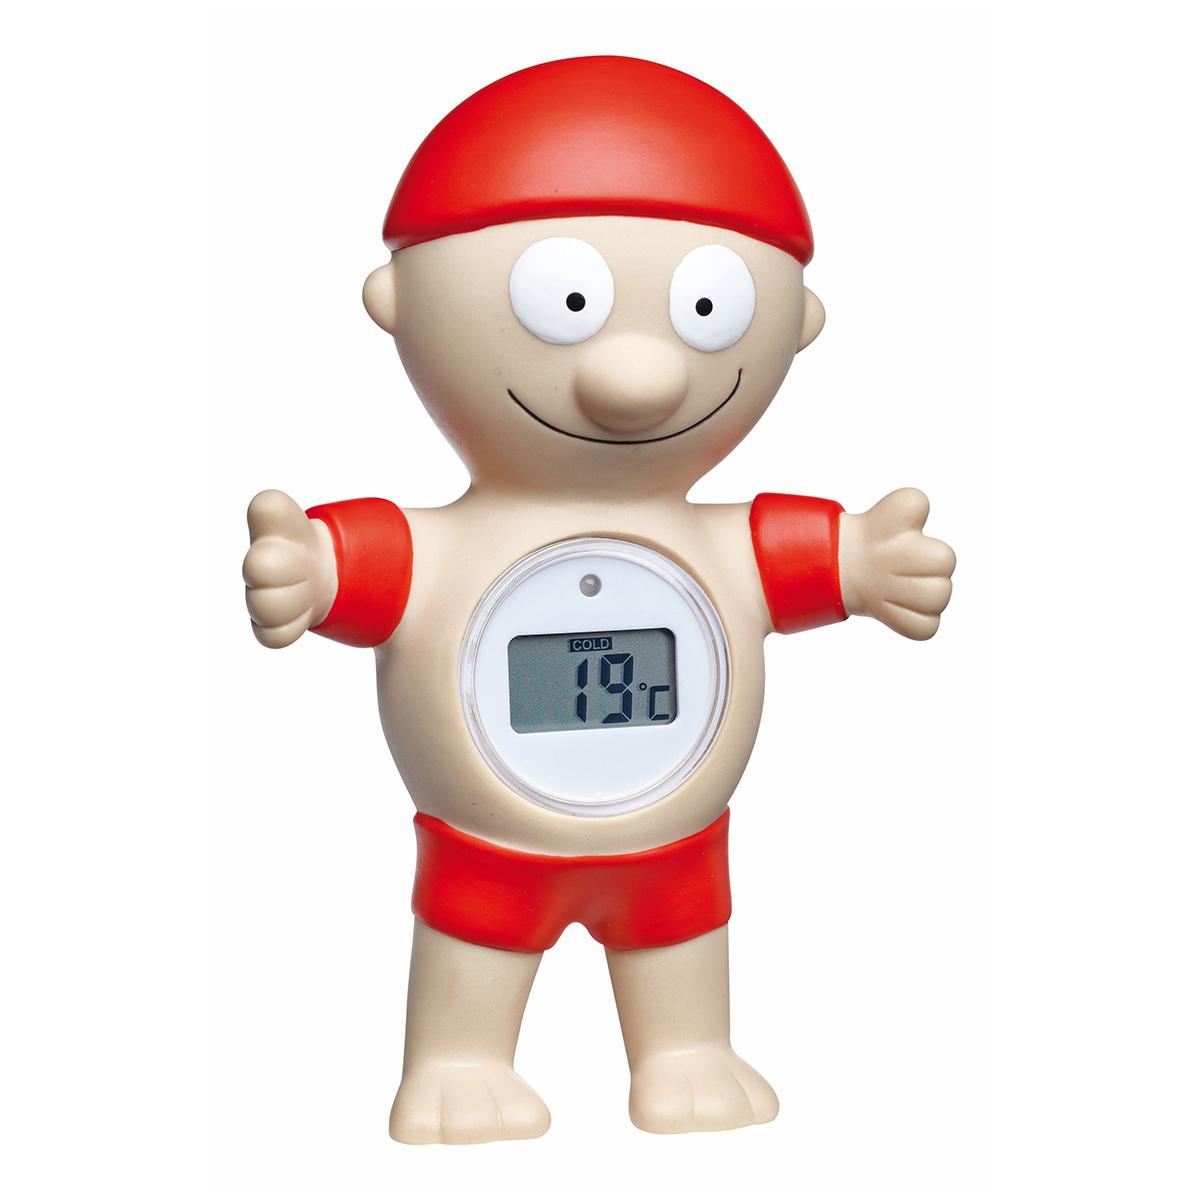 30-2032-05-digitales-badethermometer-bademeister-anwendung1-1200x1200px.jpg